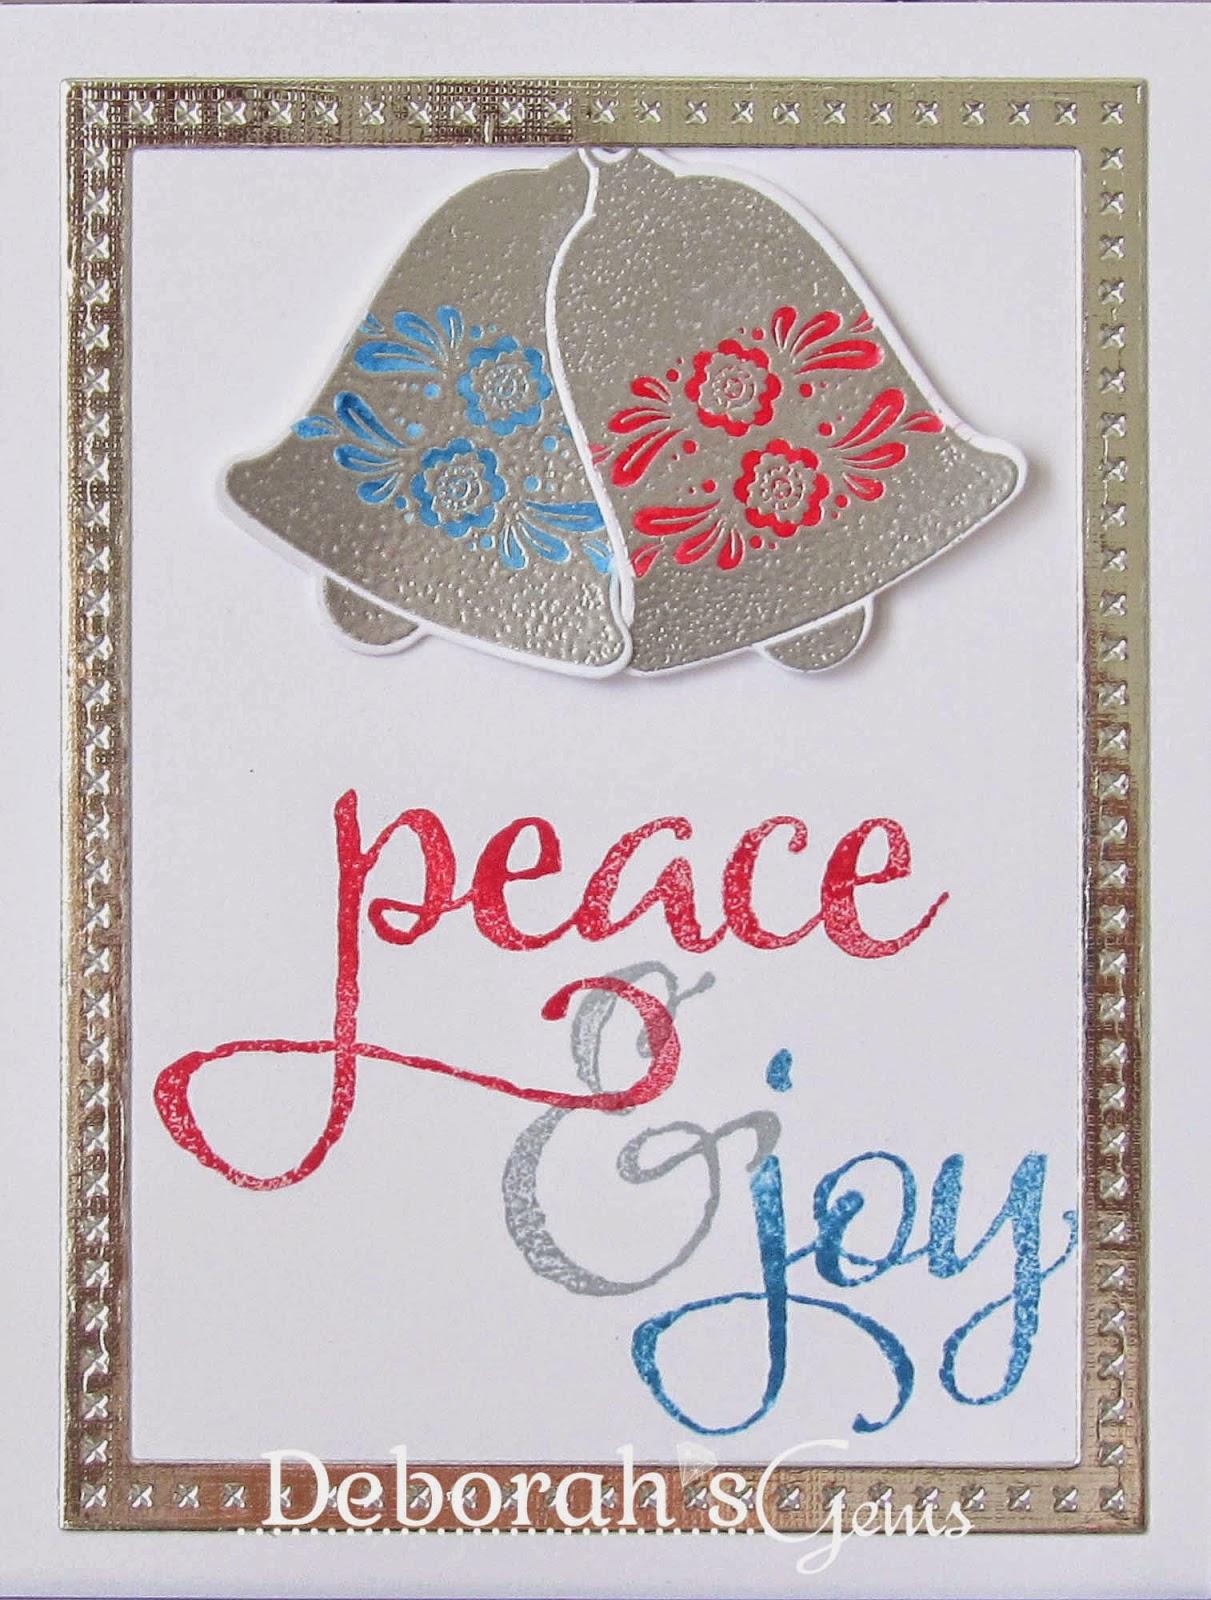 Peace & Joy - photo by Deborah Frings - Deborah's Gems